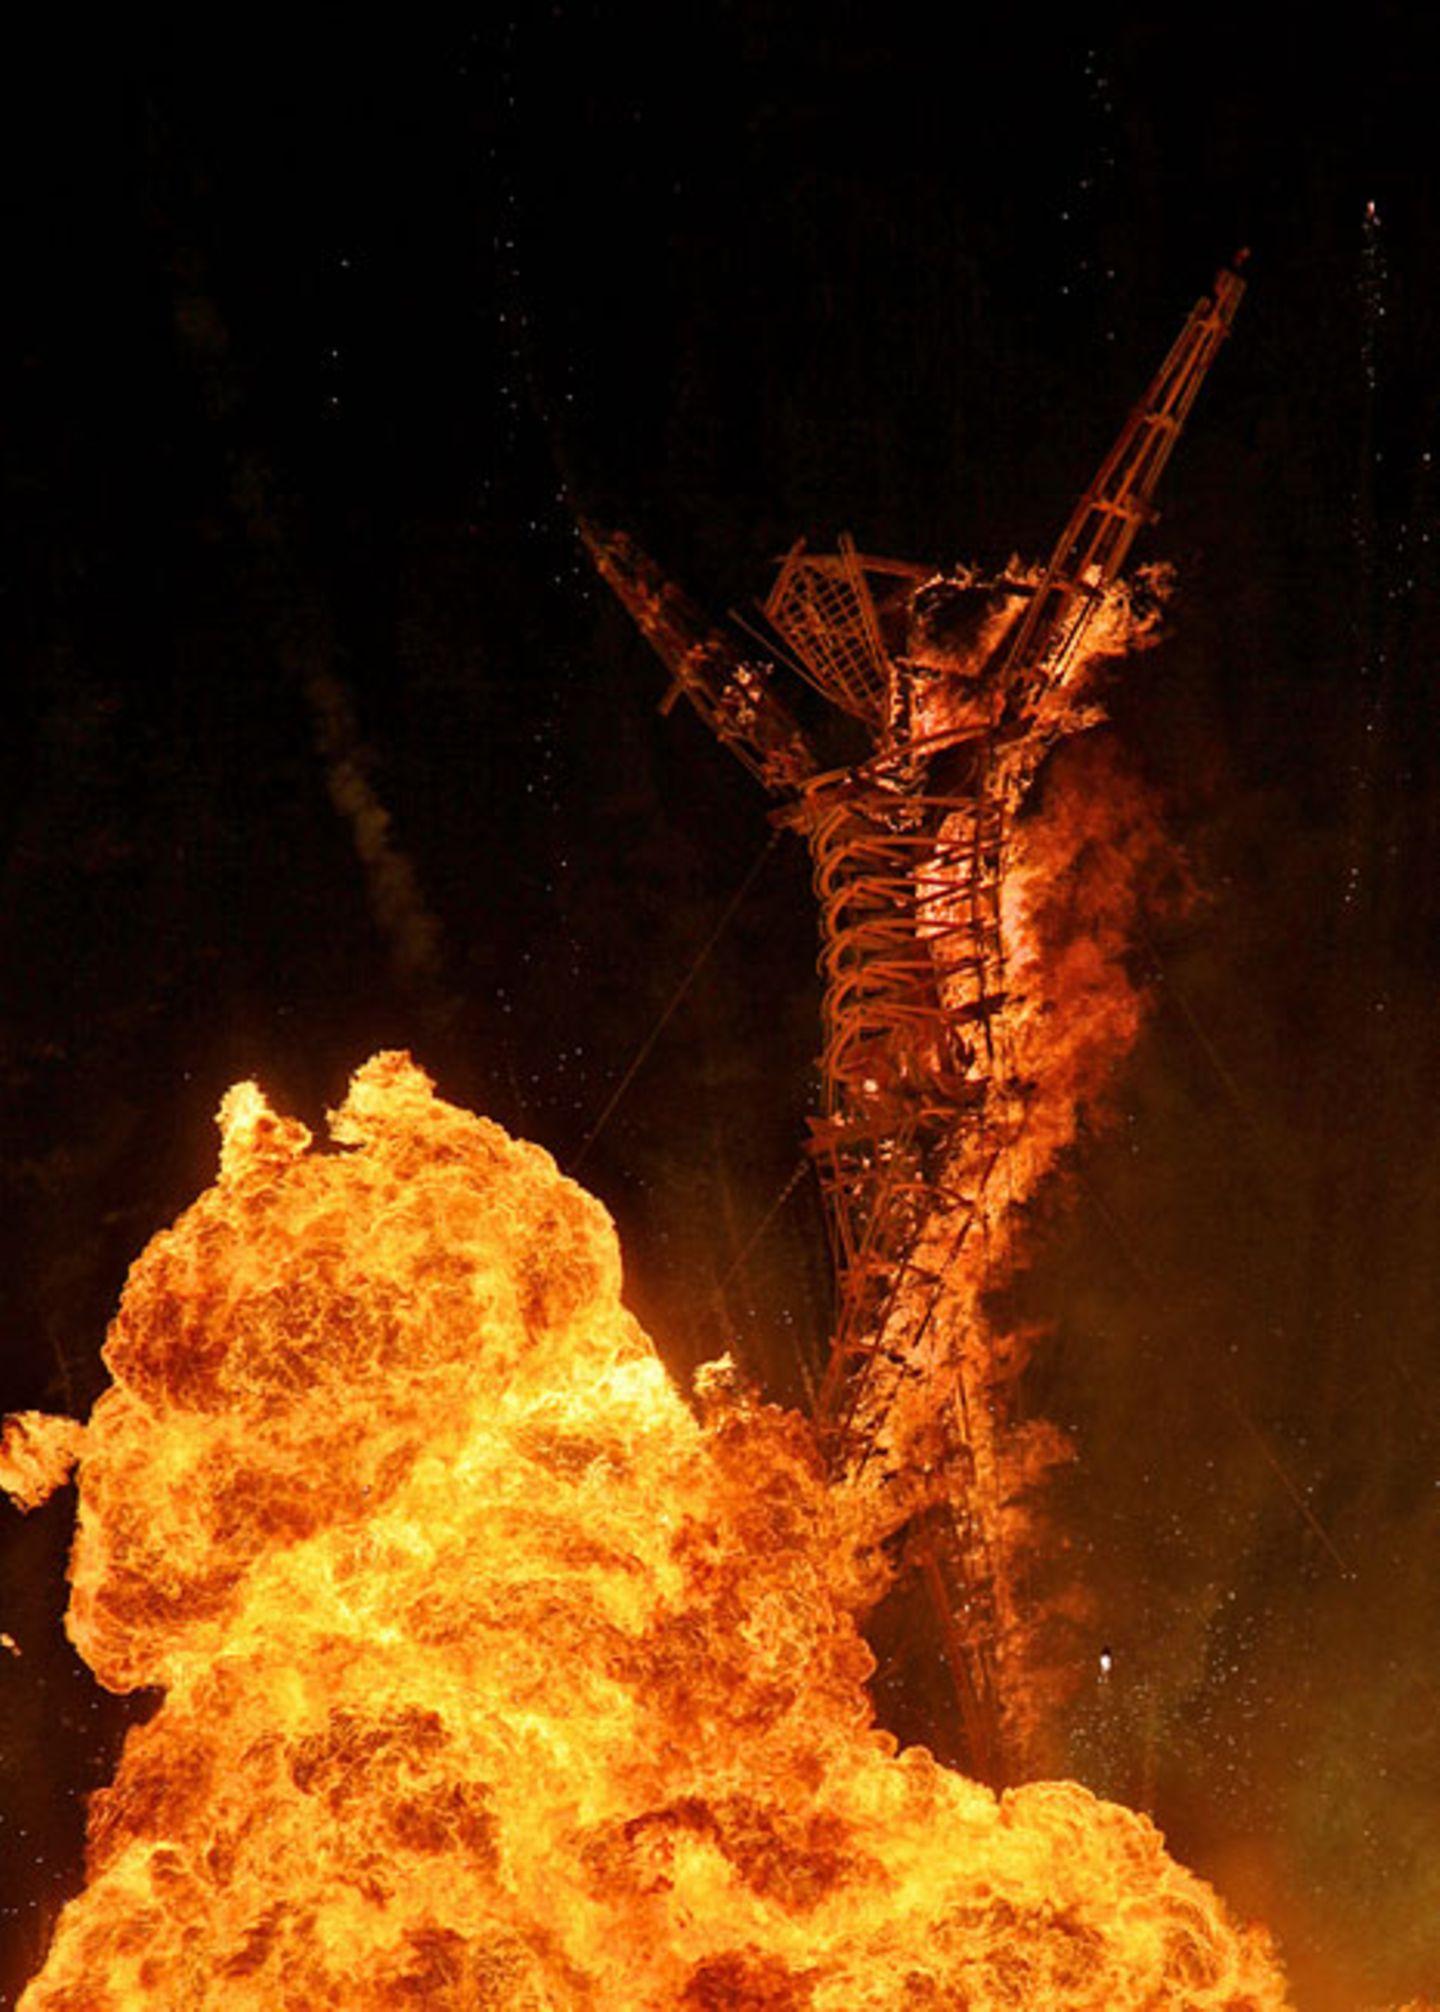 Man Burn, 2011, von Larry Harvey, Jerry James, Dan Miller, the Man Krew, Lewis Zaumeyer and Andrew Johnstone